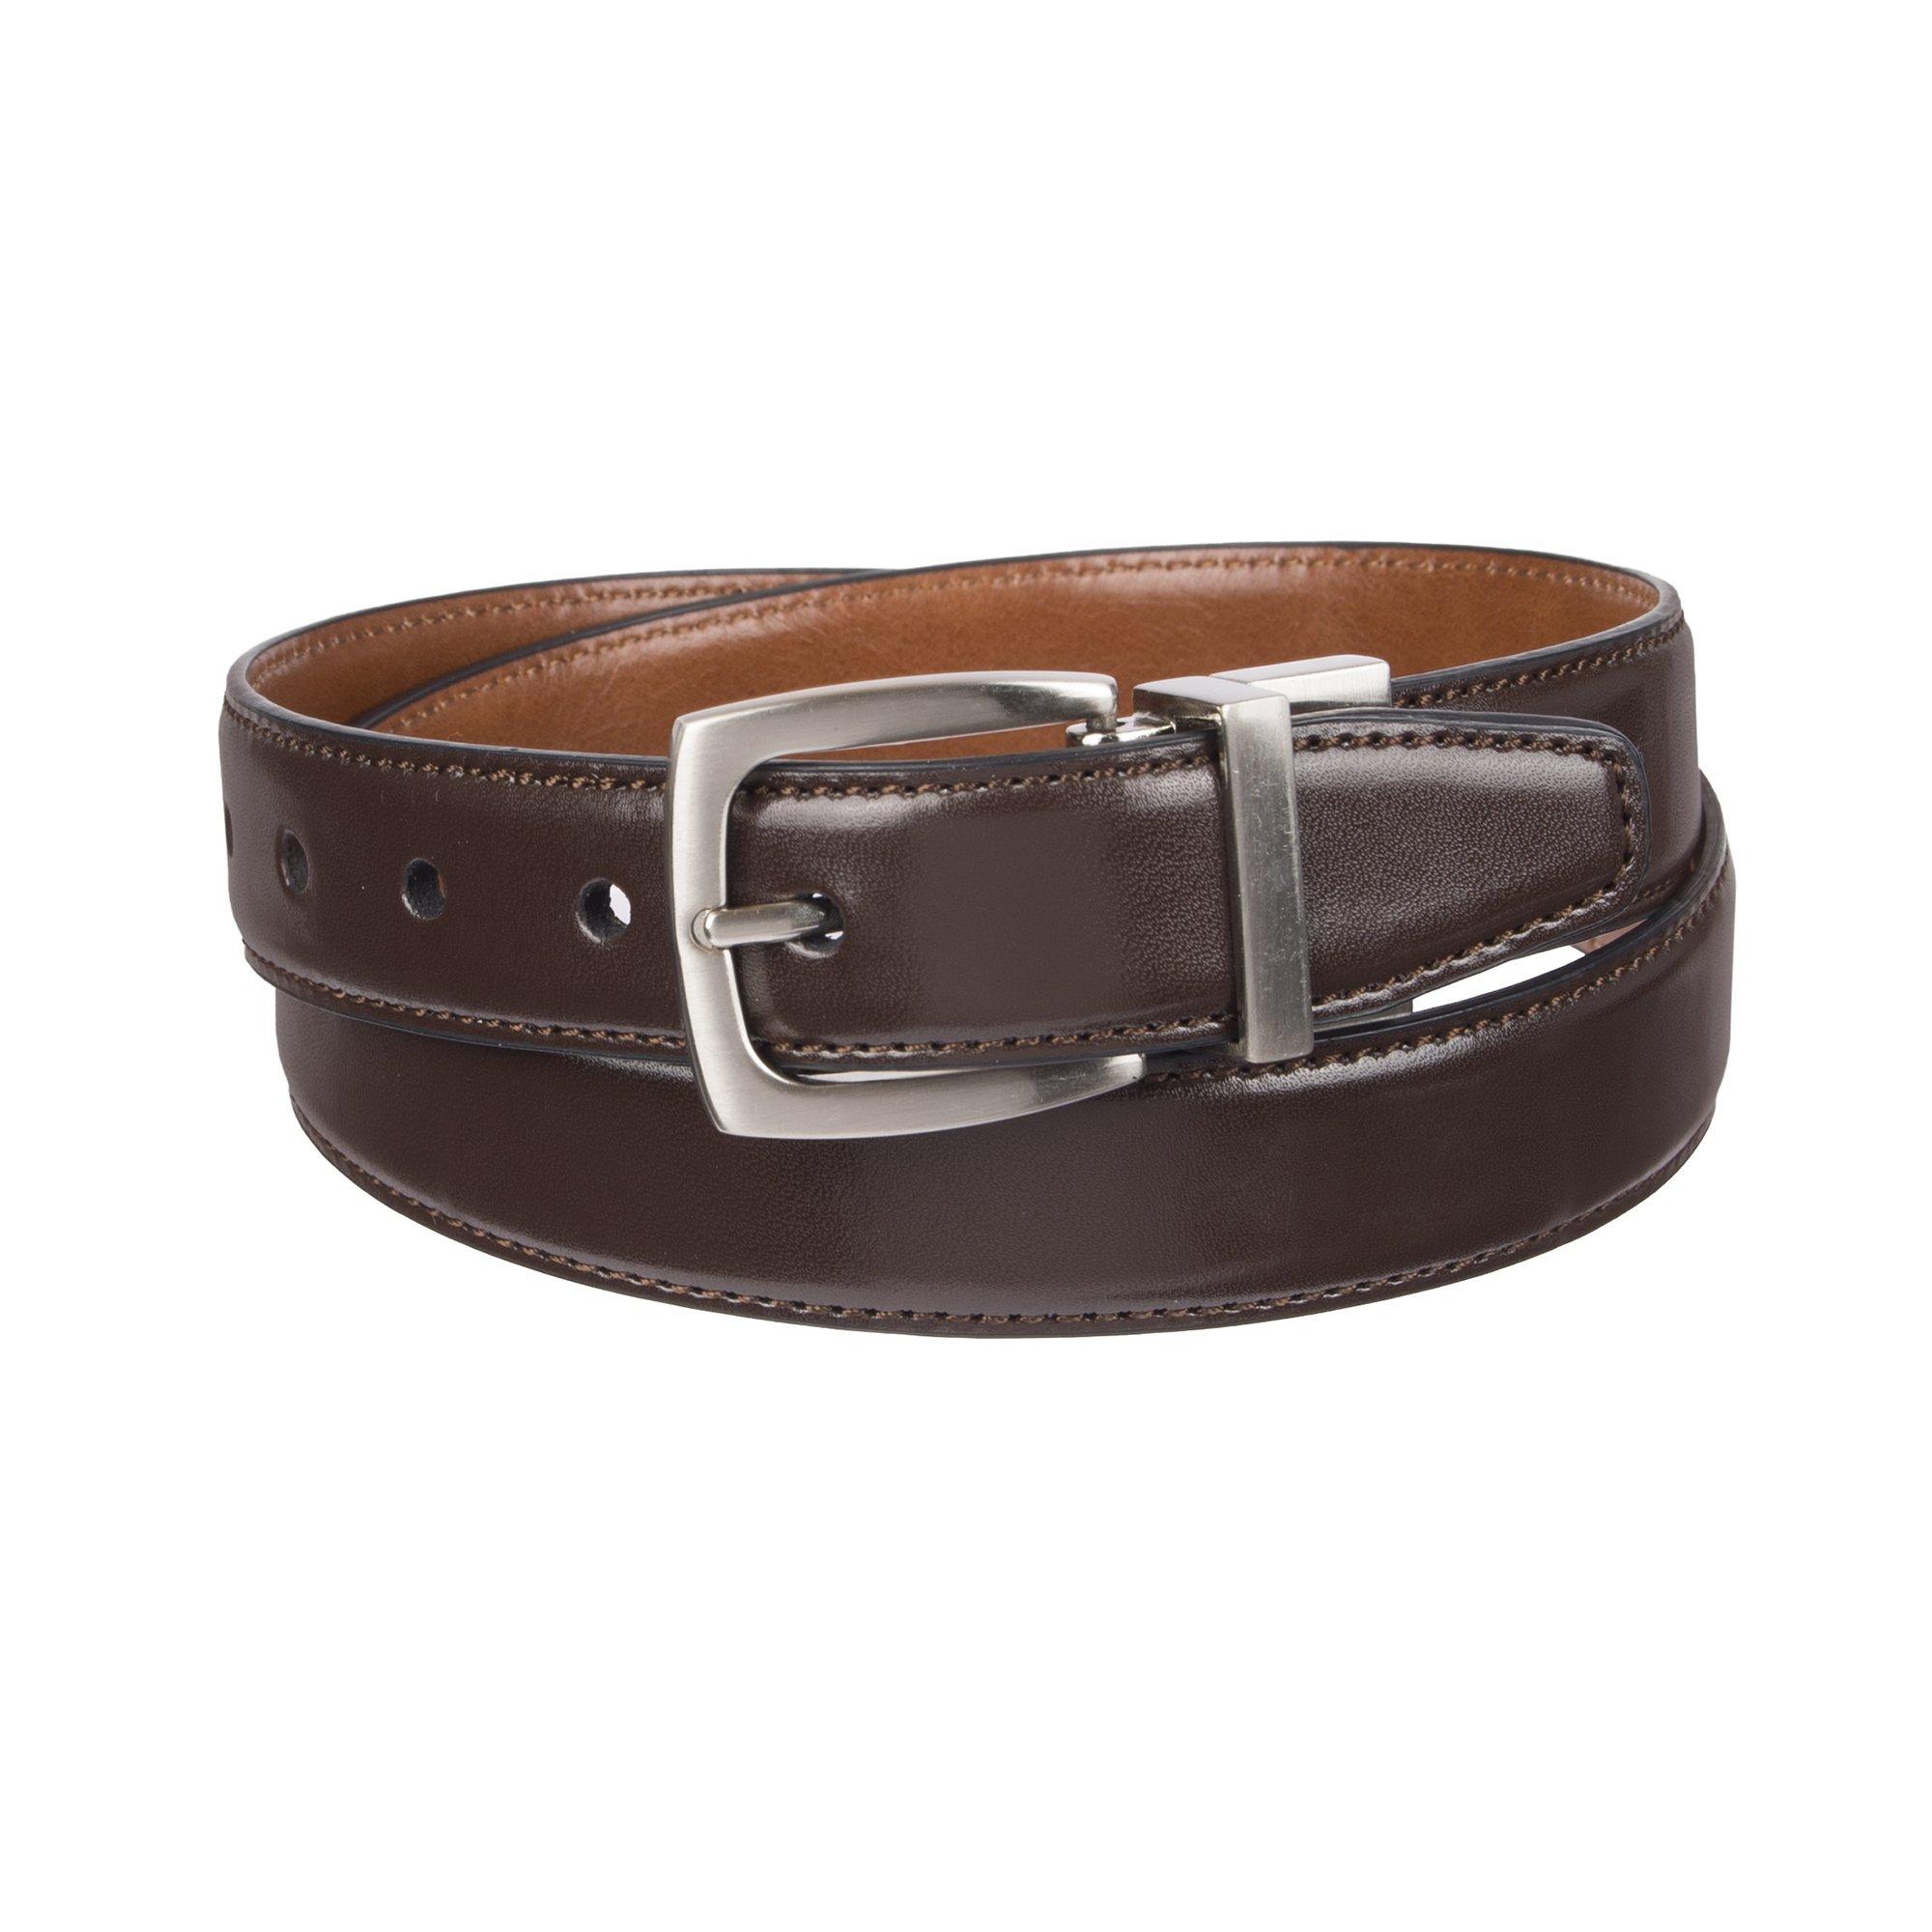 Dockers Big Boy's Dockers Reversible Black-to-Brown Belt, brown/tan, Large (30-32 Inches)